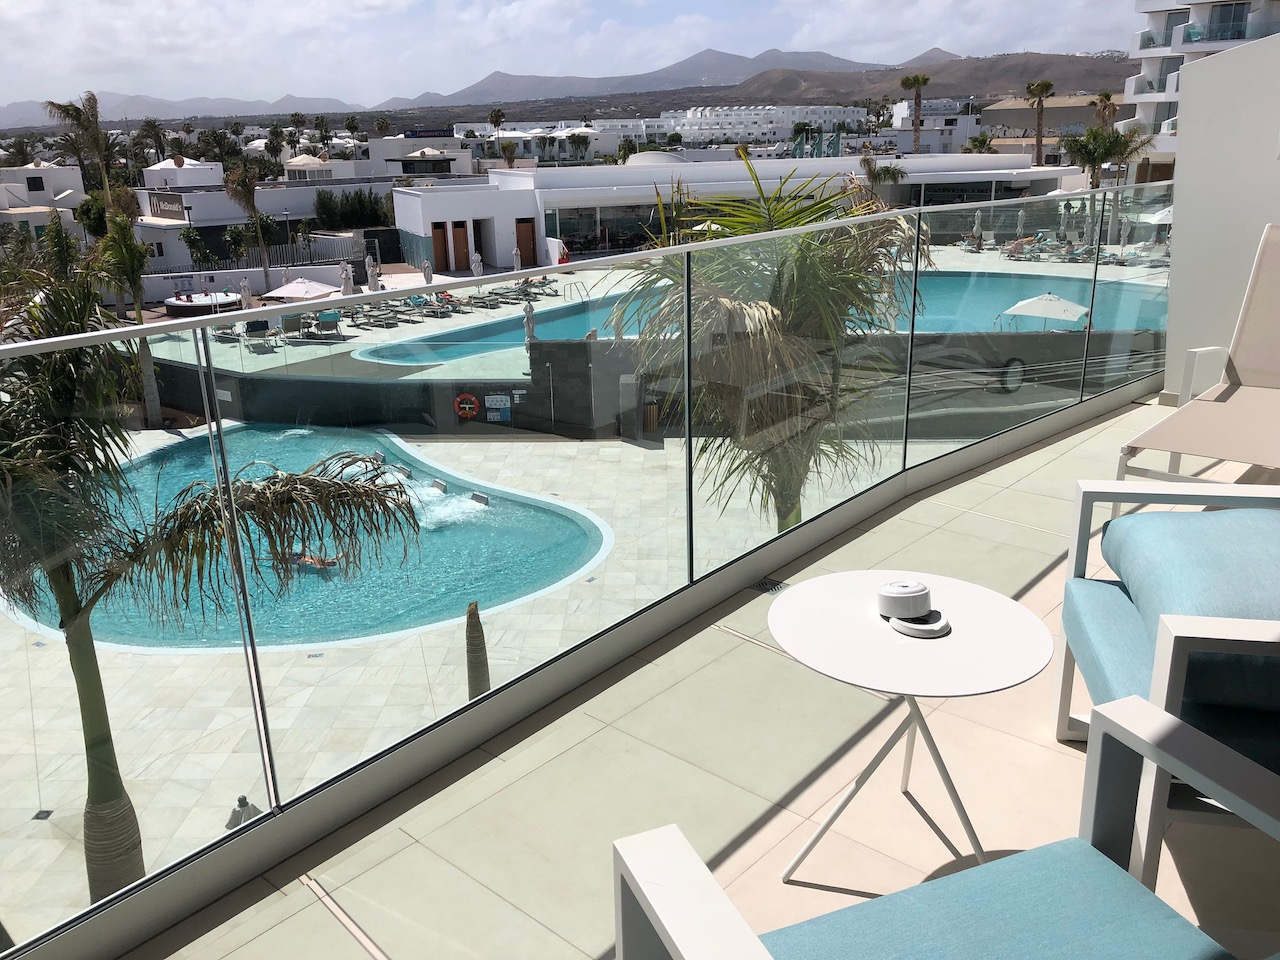 Lava Beach Hotel Junior Suite Pool View Balcony